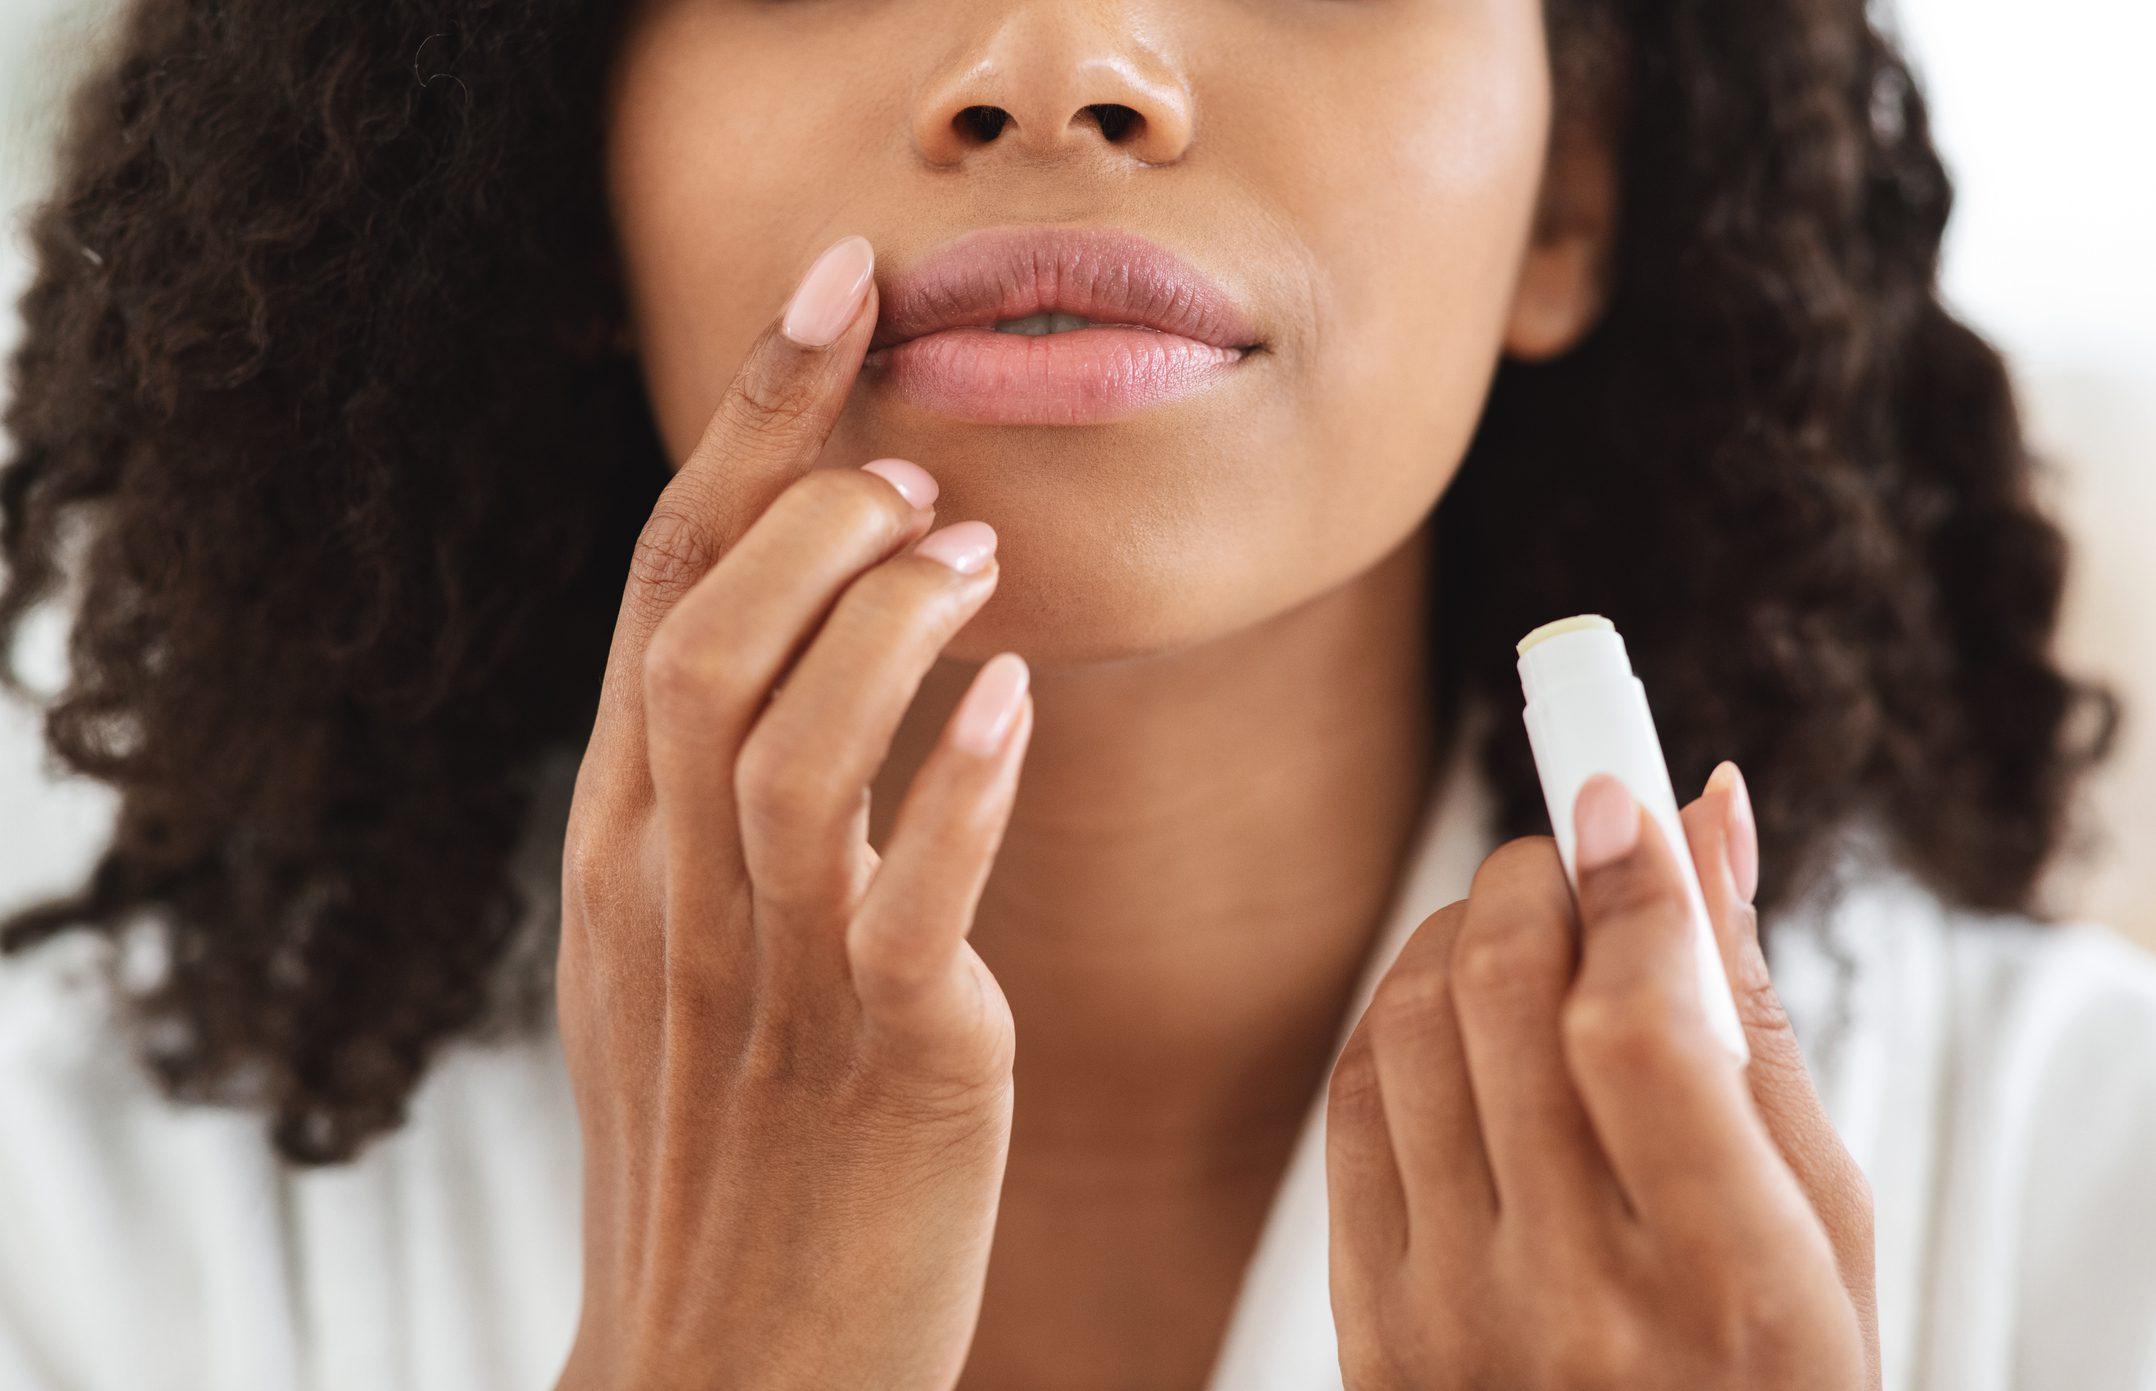 Woman applying moisturising chapstick on lips